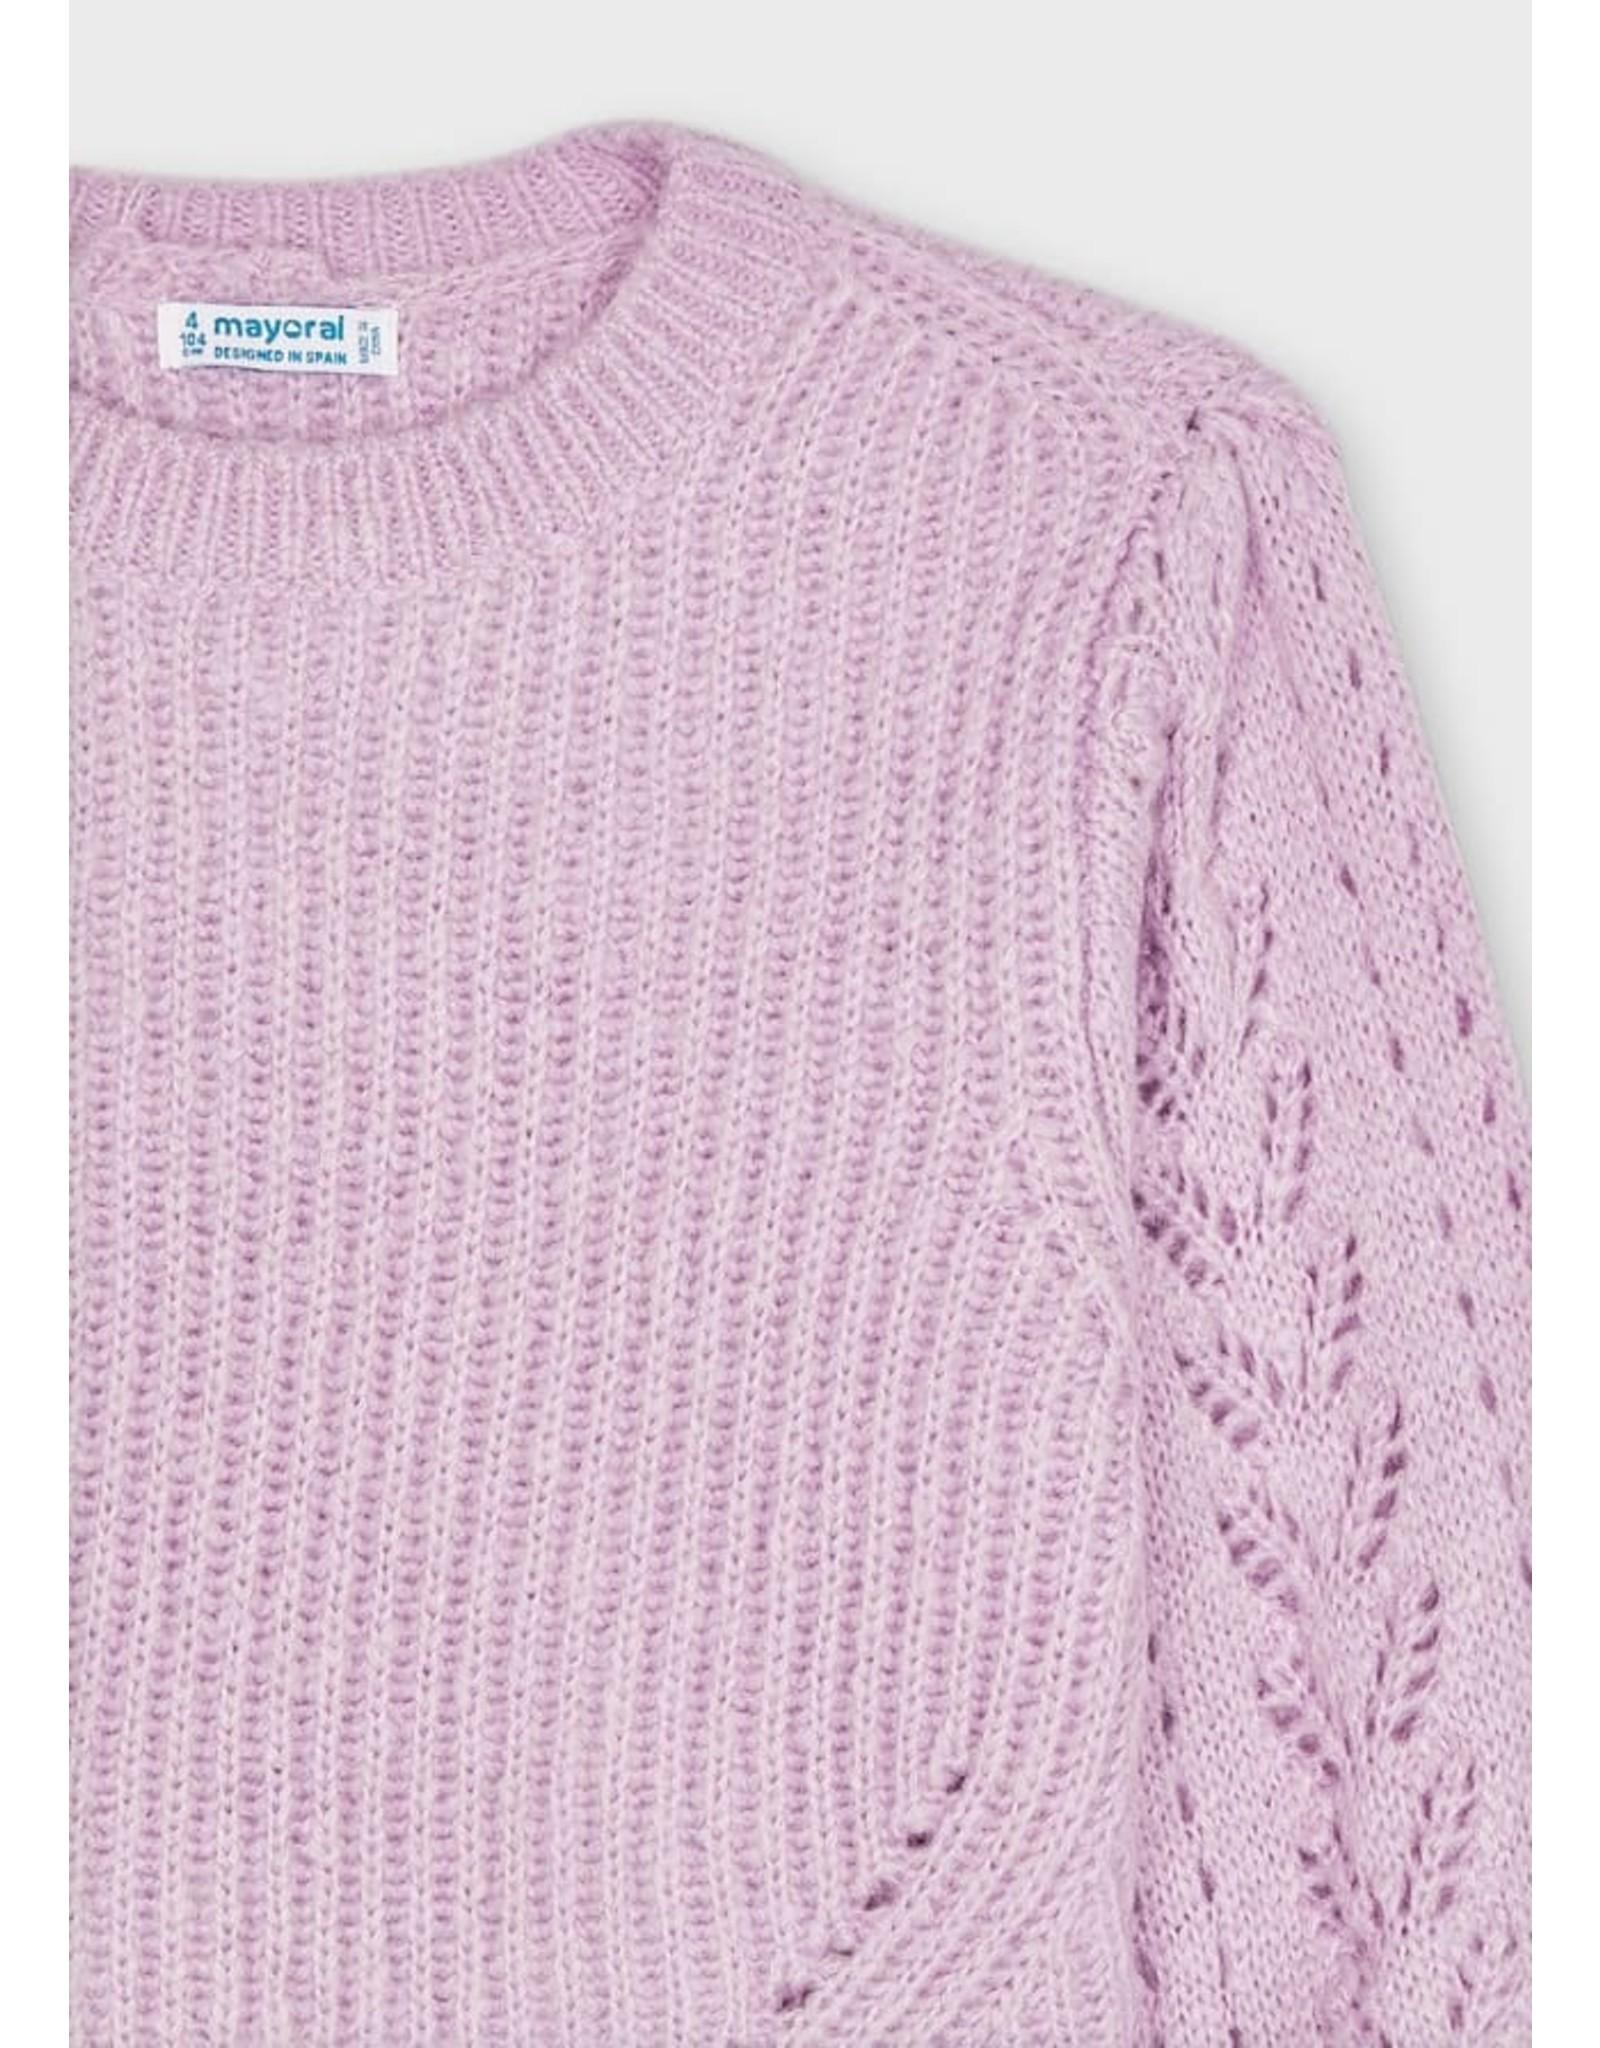 Mayoral Lilac Sweater with Headband